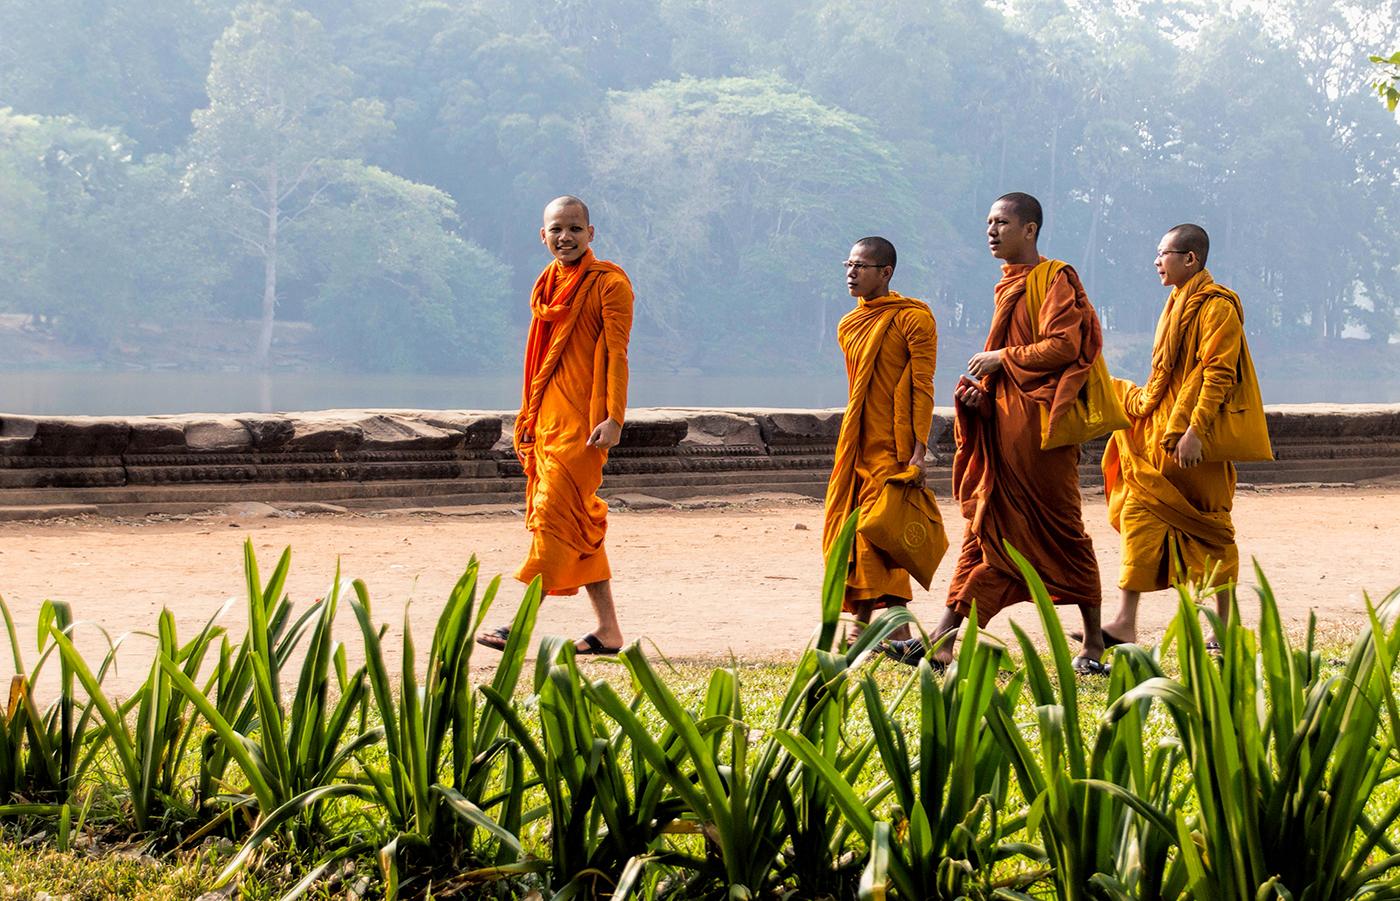 Budhist Monks